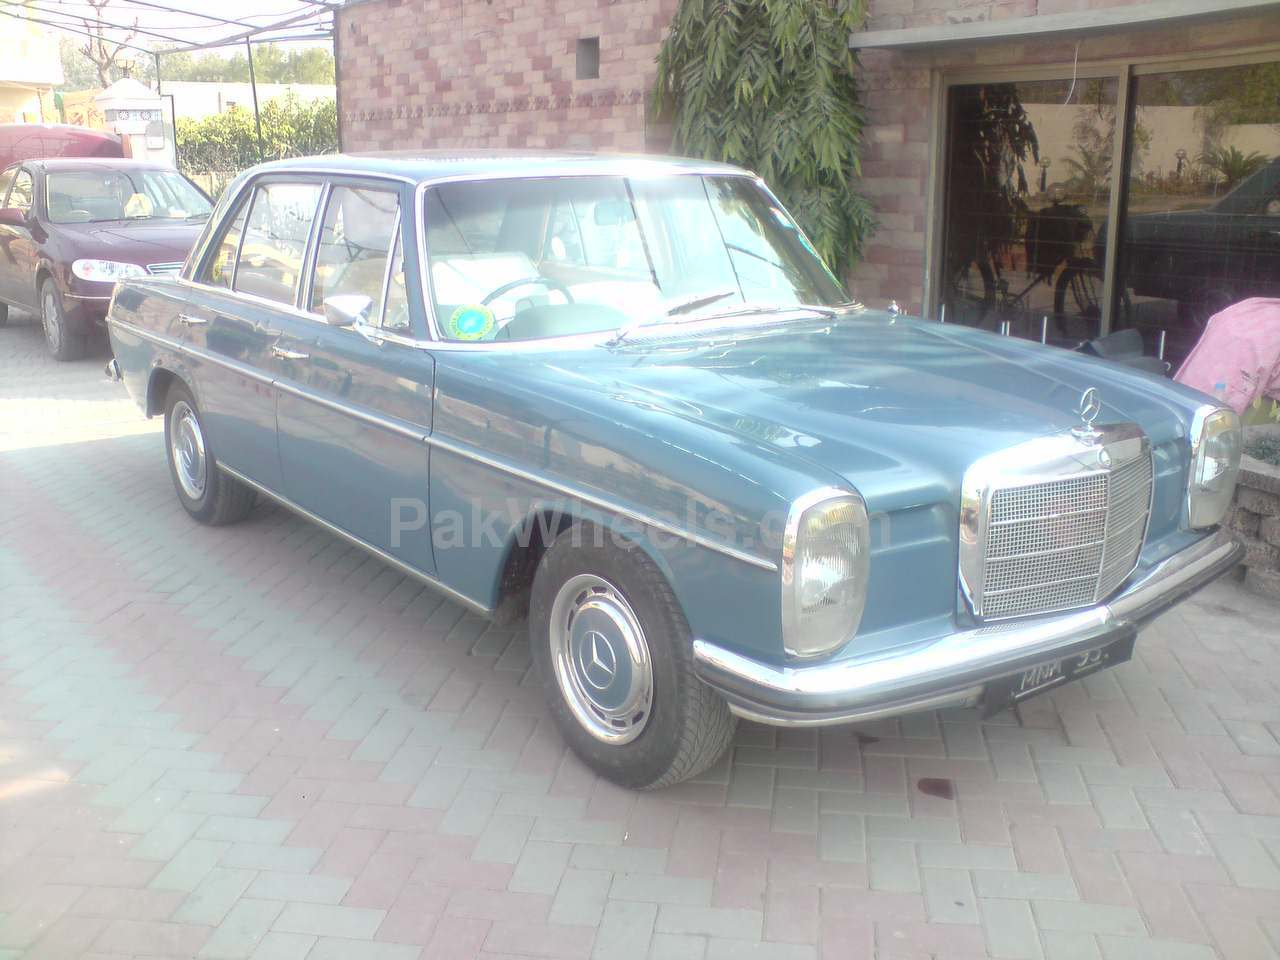 Mercedes Benz E Class - 1969 benz Image-1